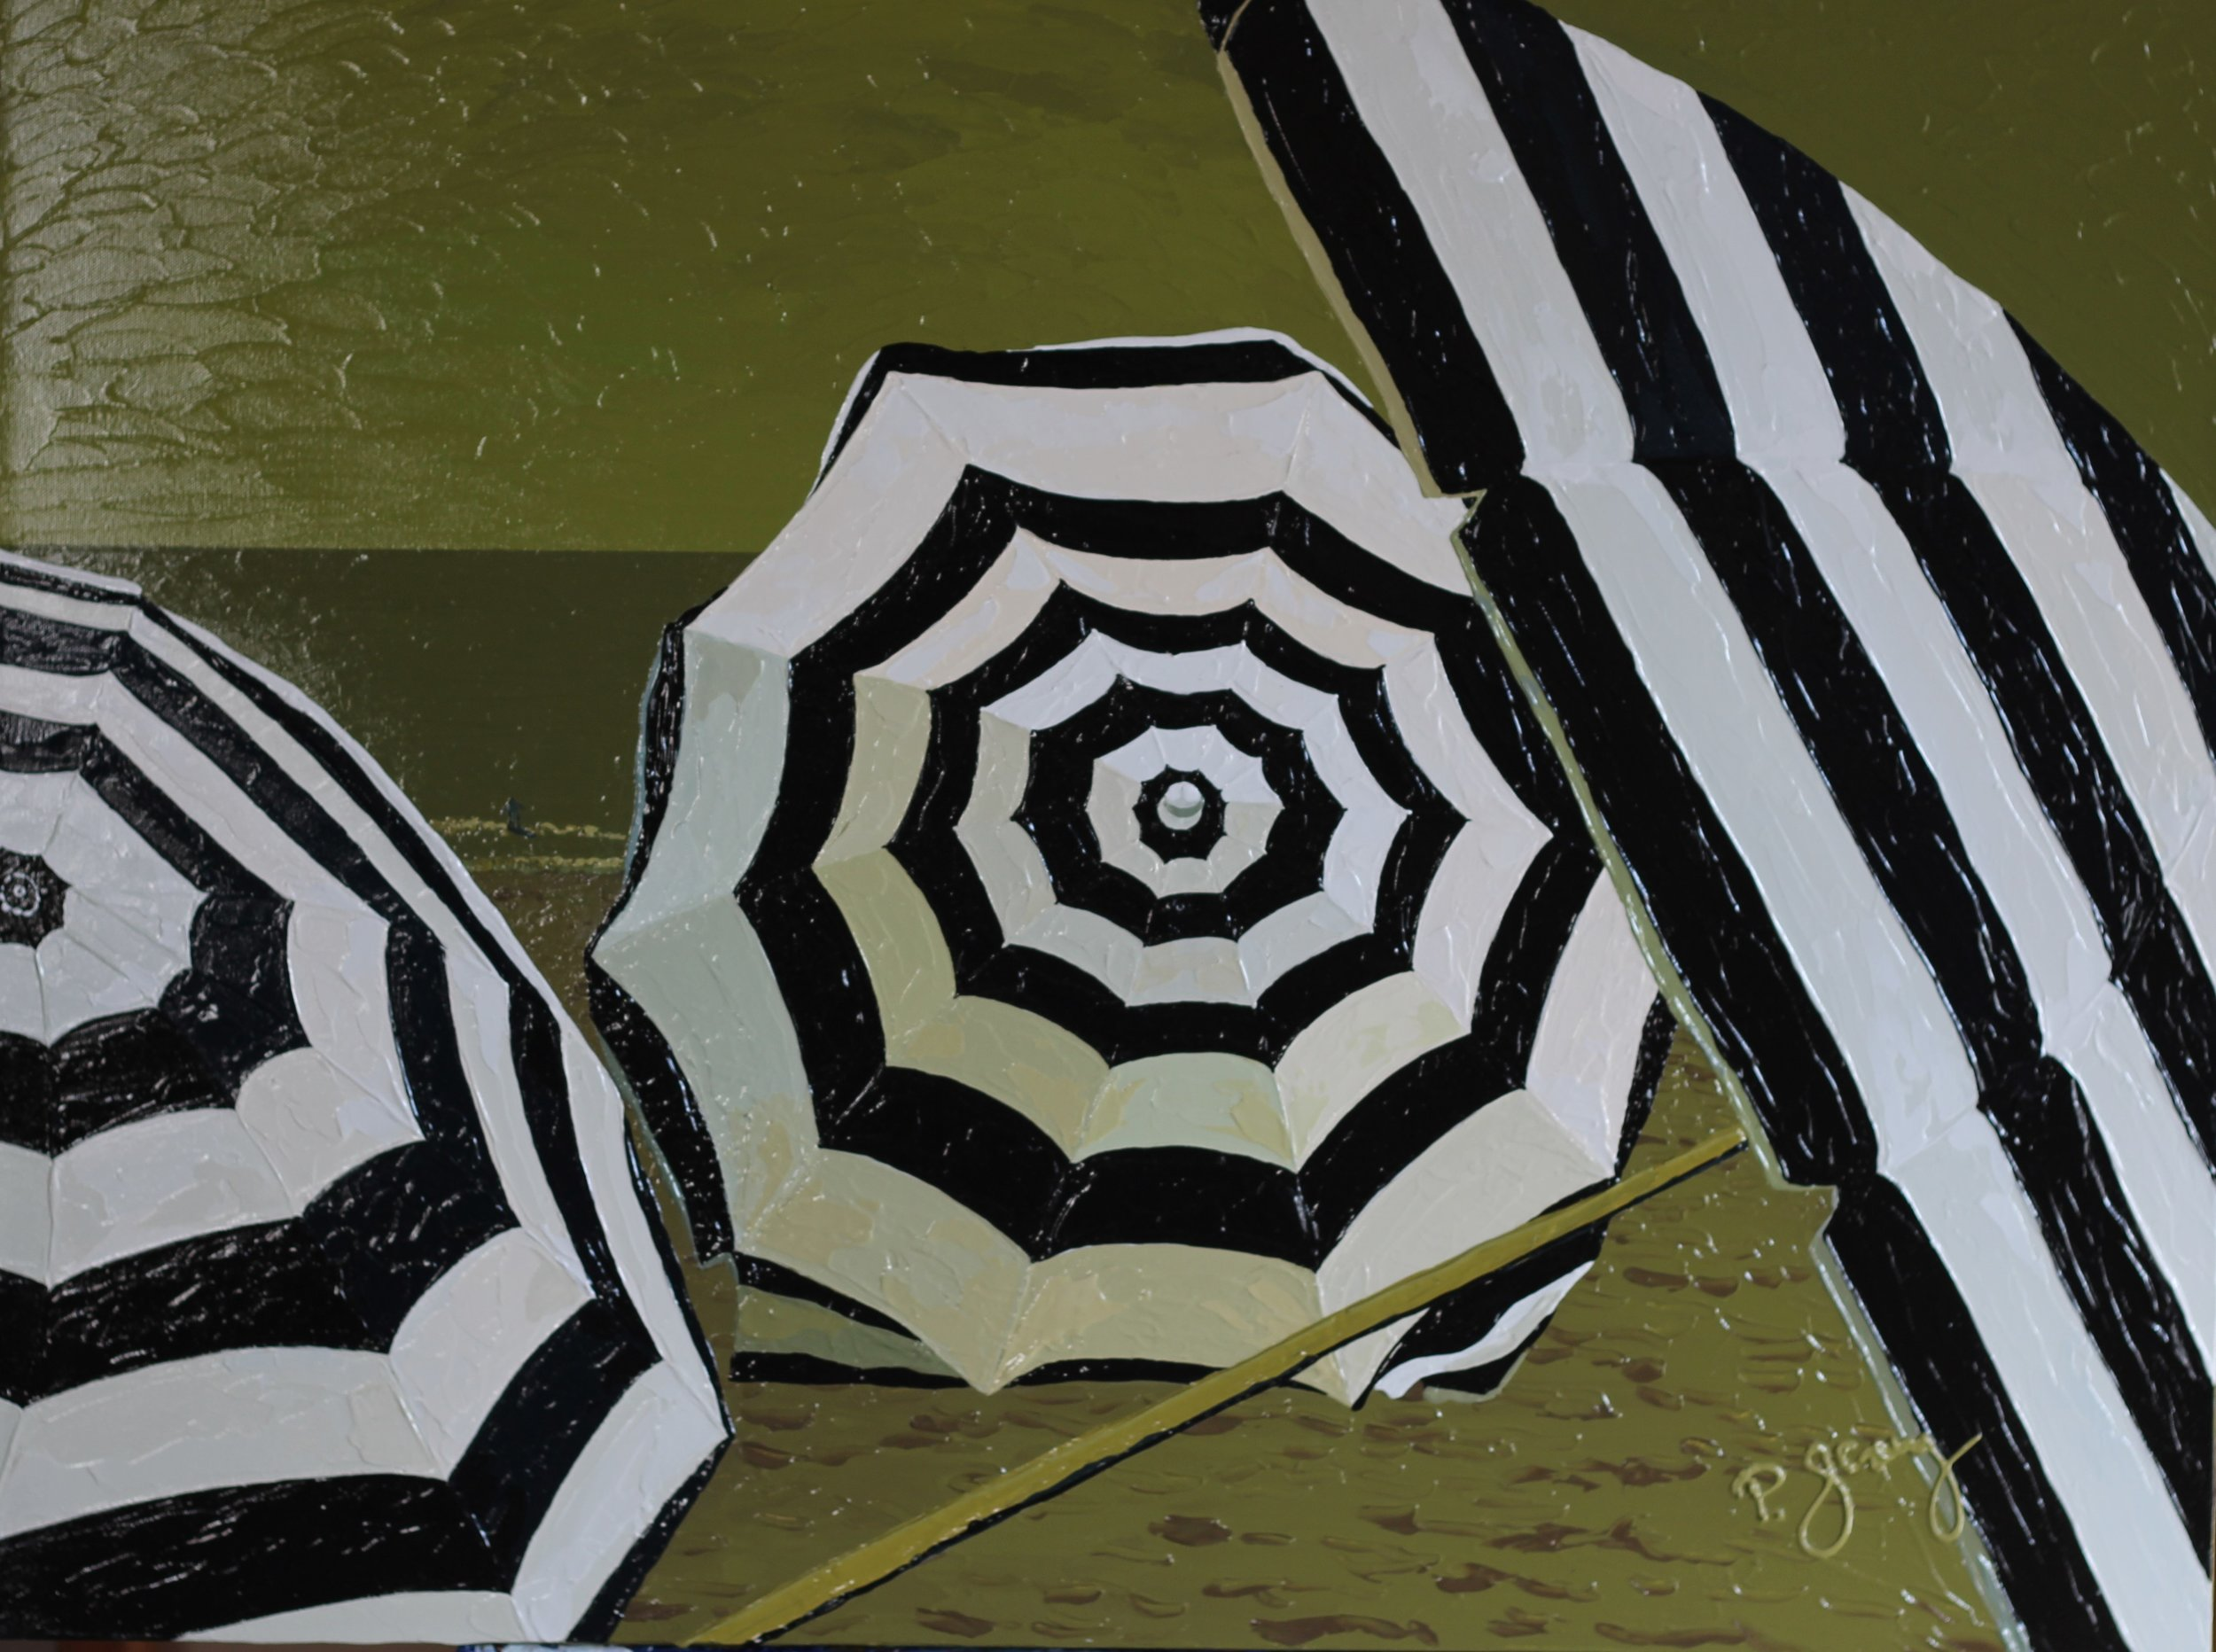 Patrick Sweeney - Painting, Robbinsdale, MN